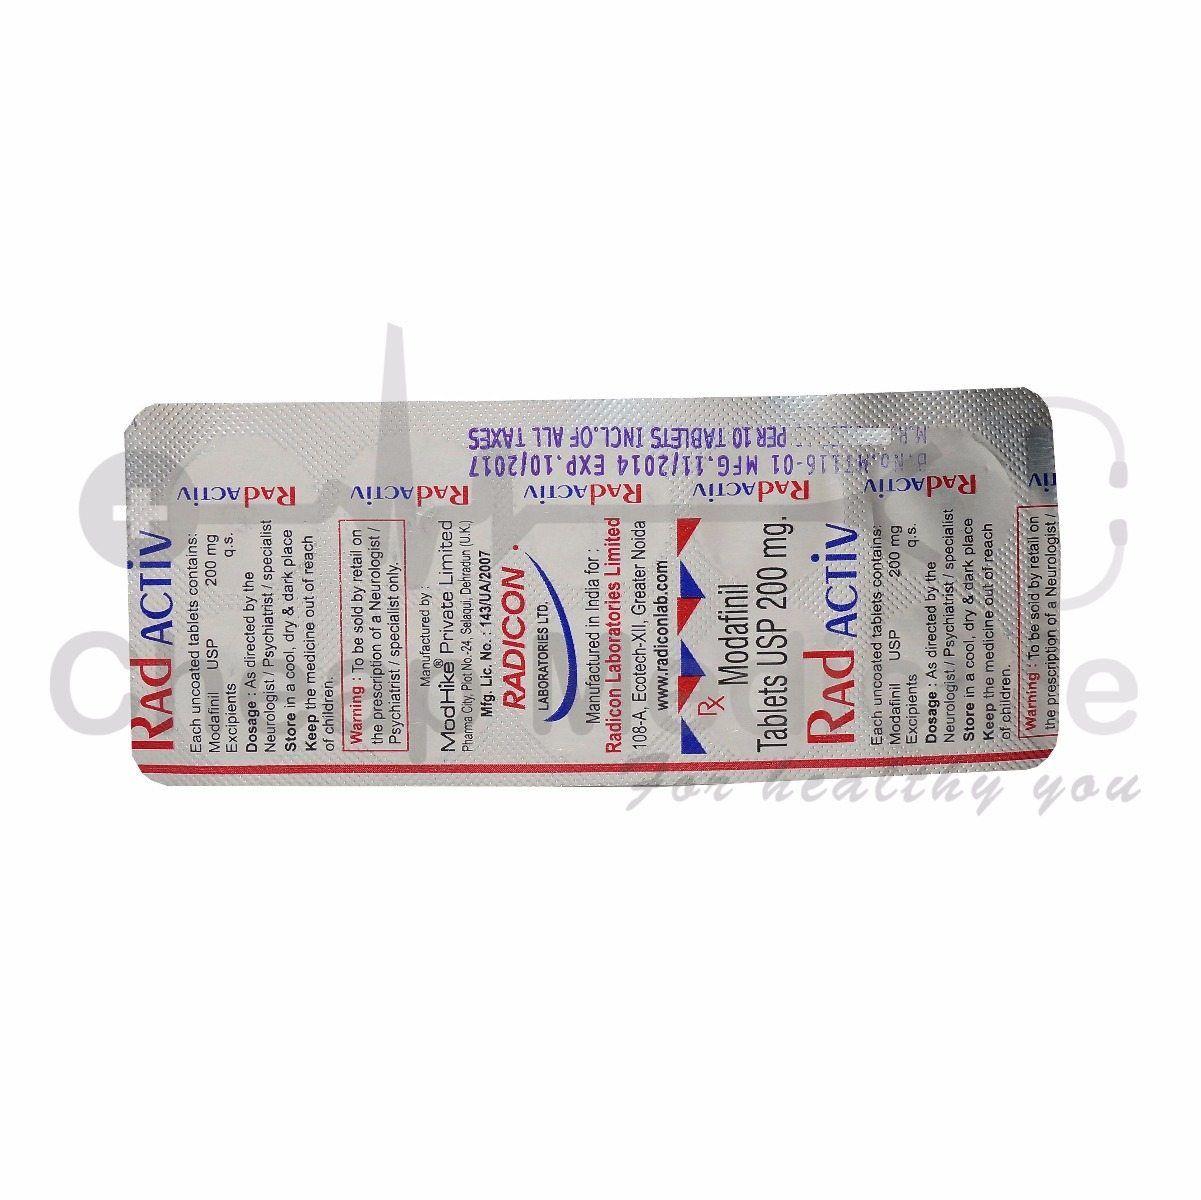 Radactiv 200mg Viagra Cialis Provigil Modafinil Cheap